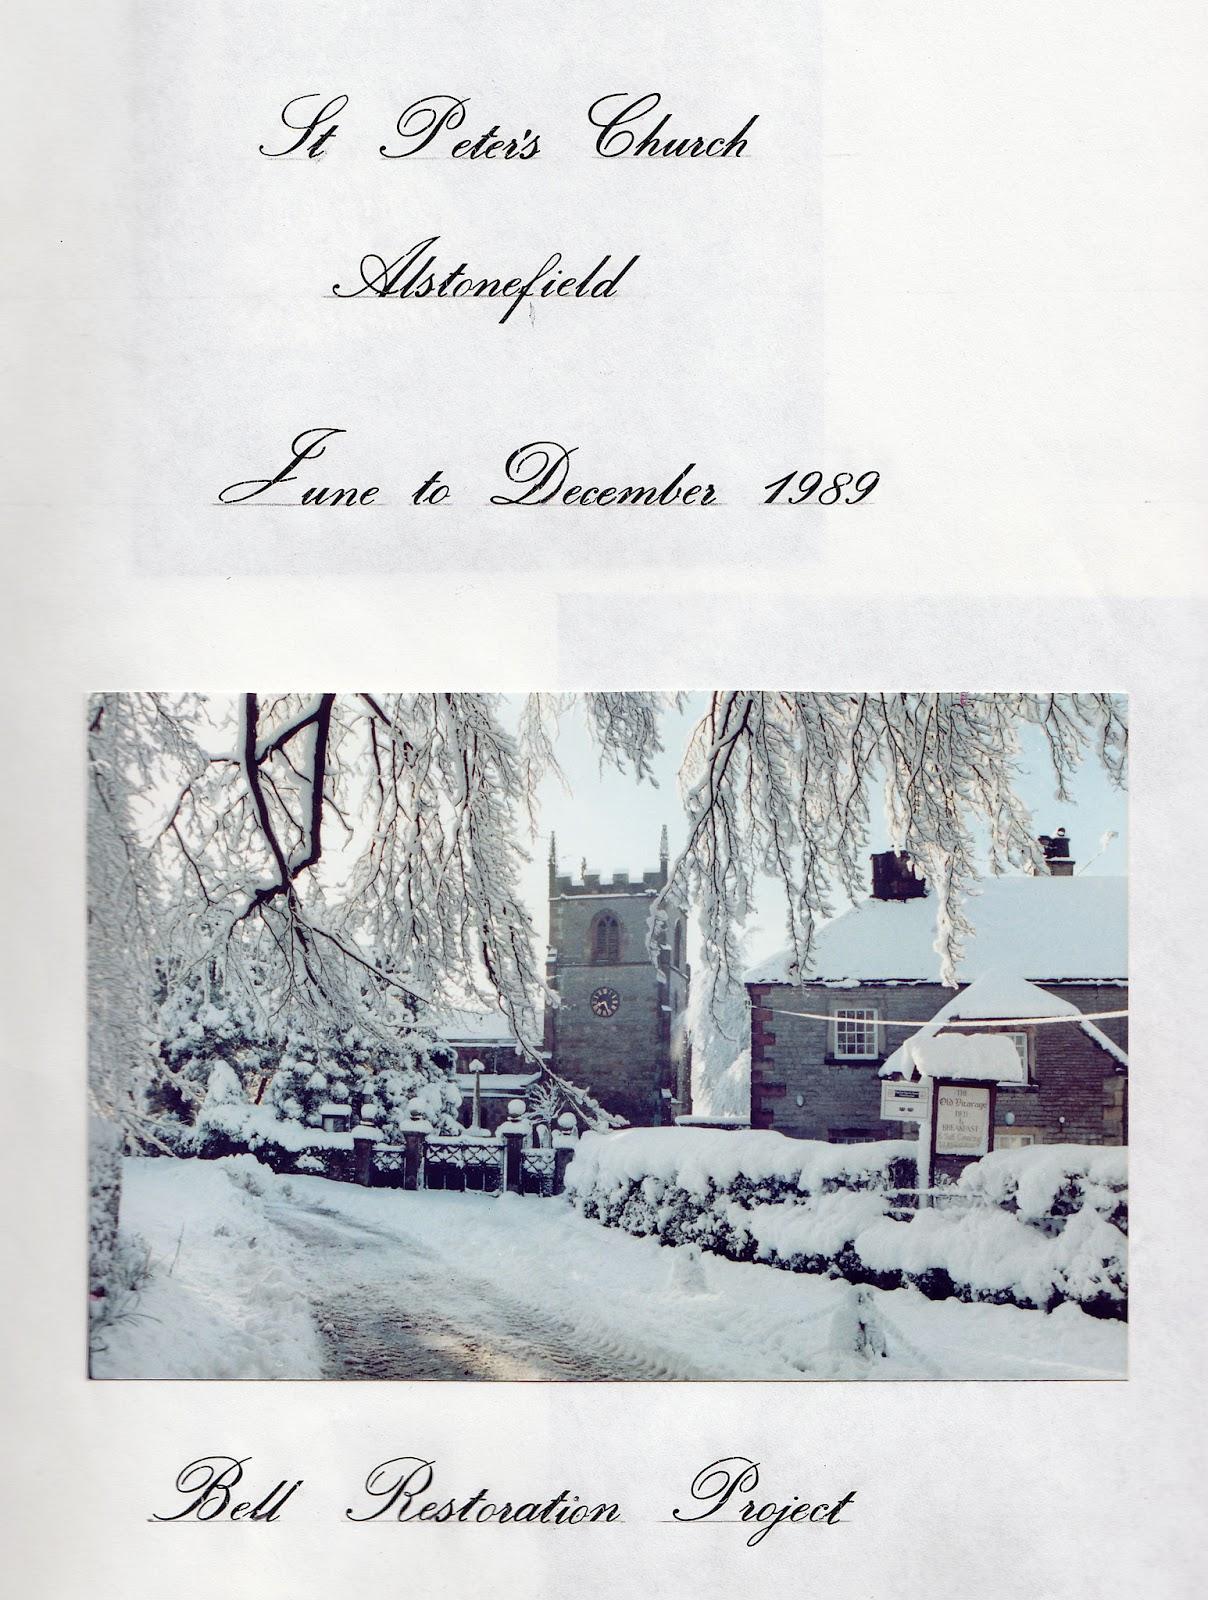 Bells Restoration 1989